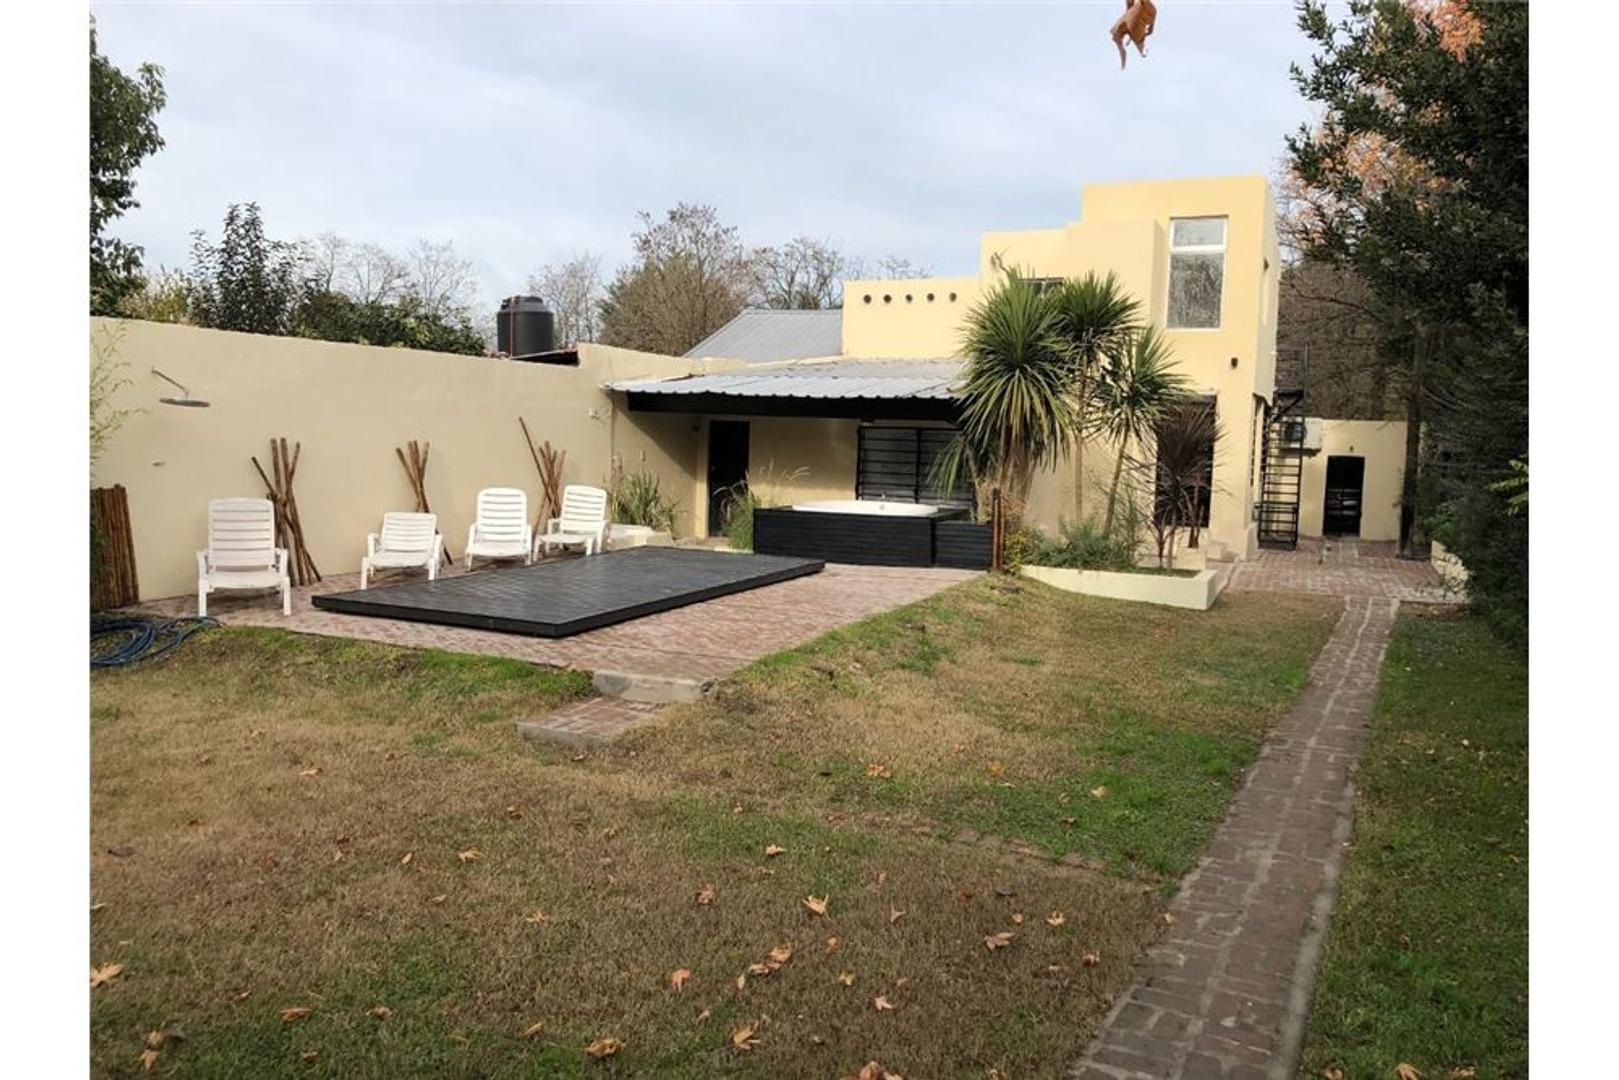 Casa parque leloir ,parque ,quincho, pileta